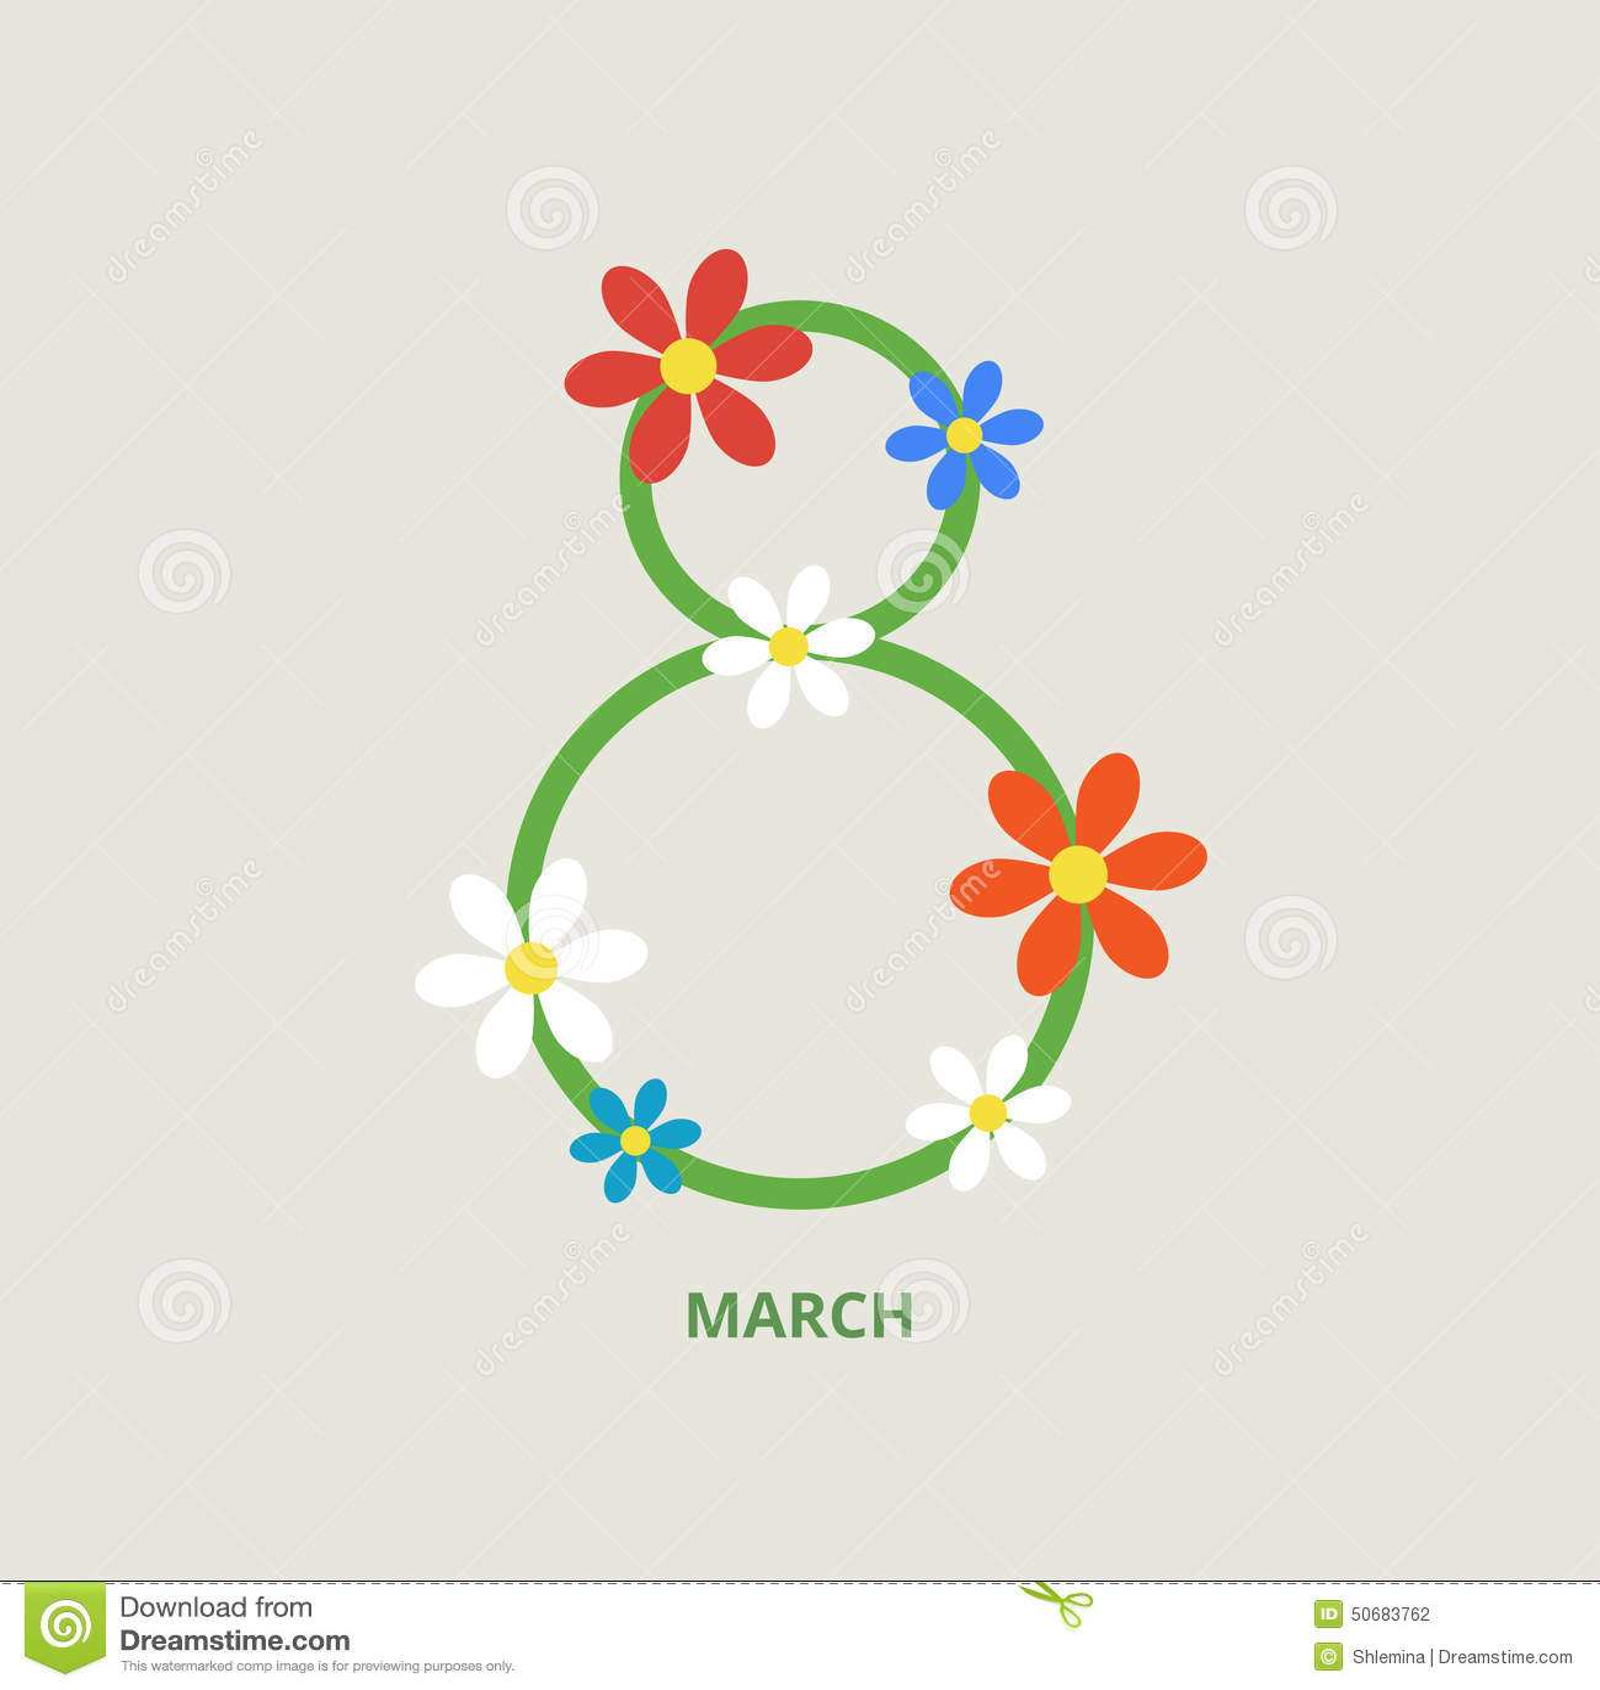 Download 3月8日贺卡 库存照片. 图片 包括有 开花, 国际, 多彩多姿, 花束, 春天, 看板卡, 妇女, 开花的 - 50683762